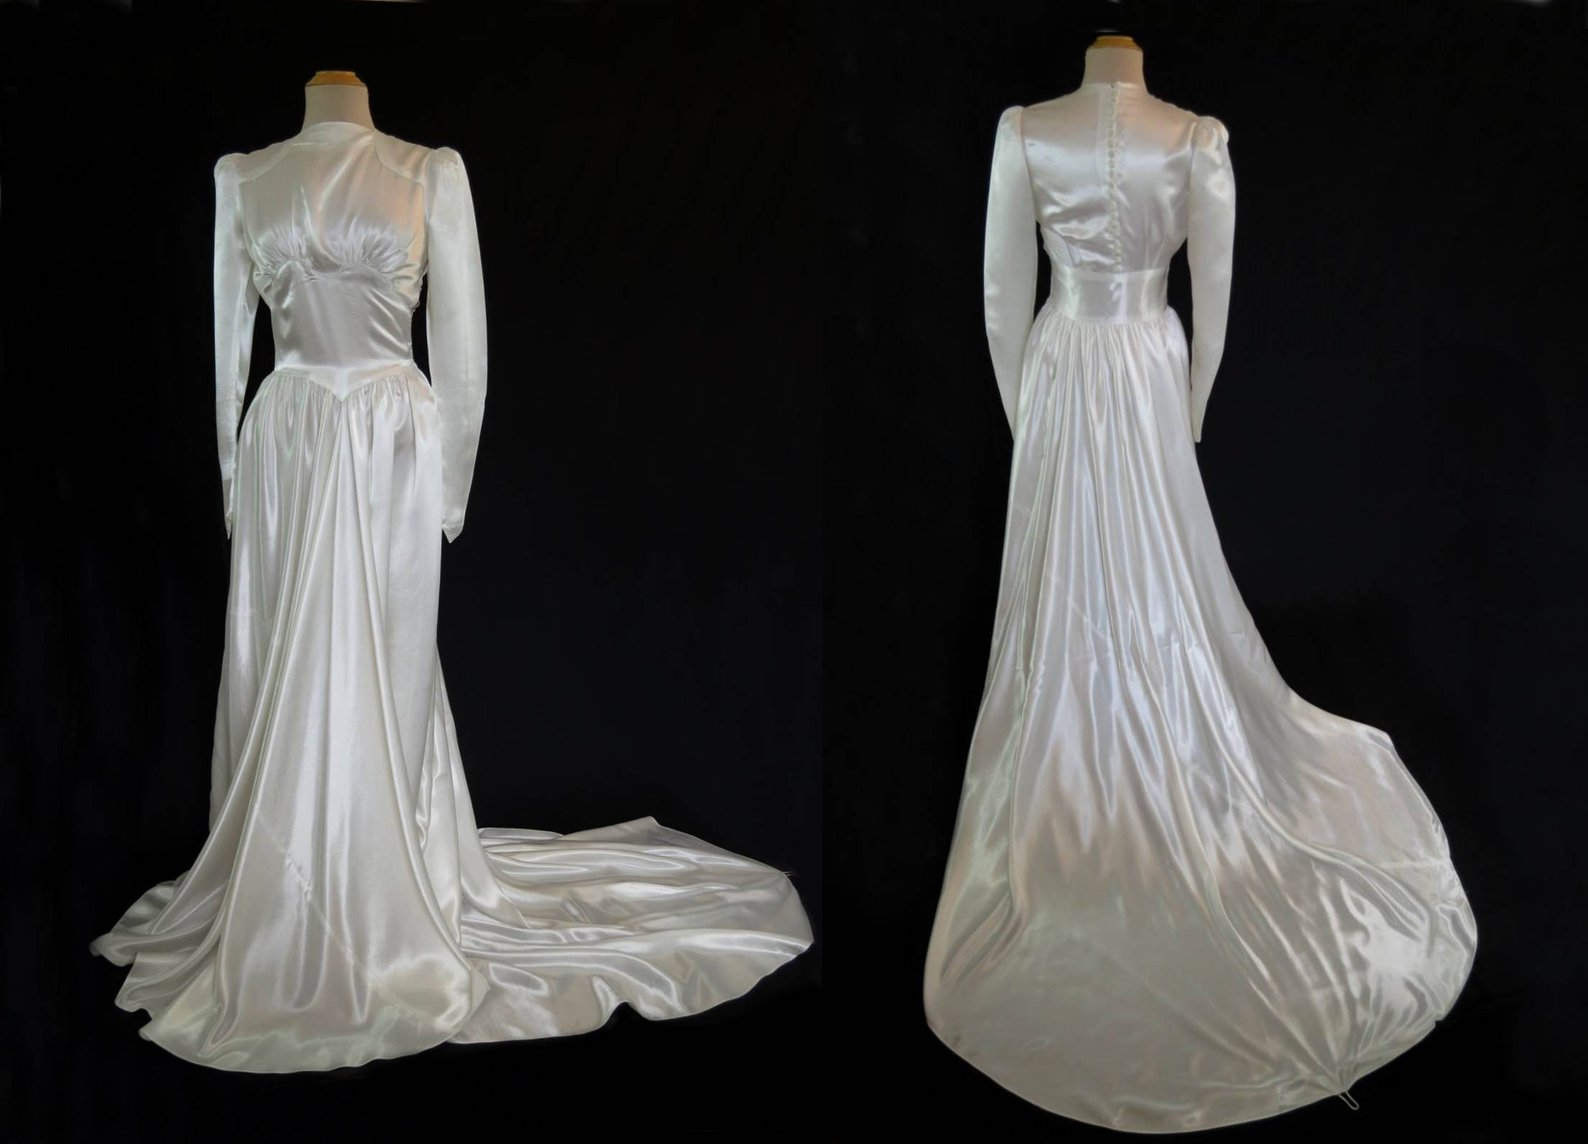 Hollywood glamour Art Deco wedding dress with train